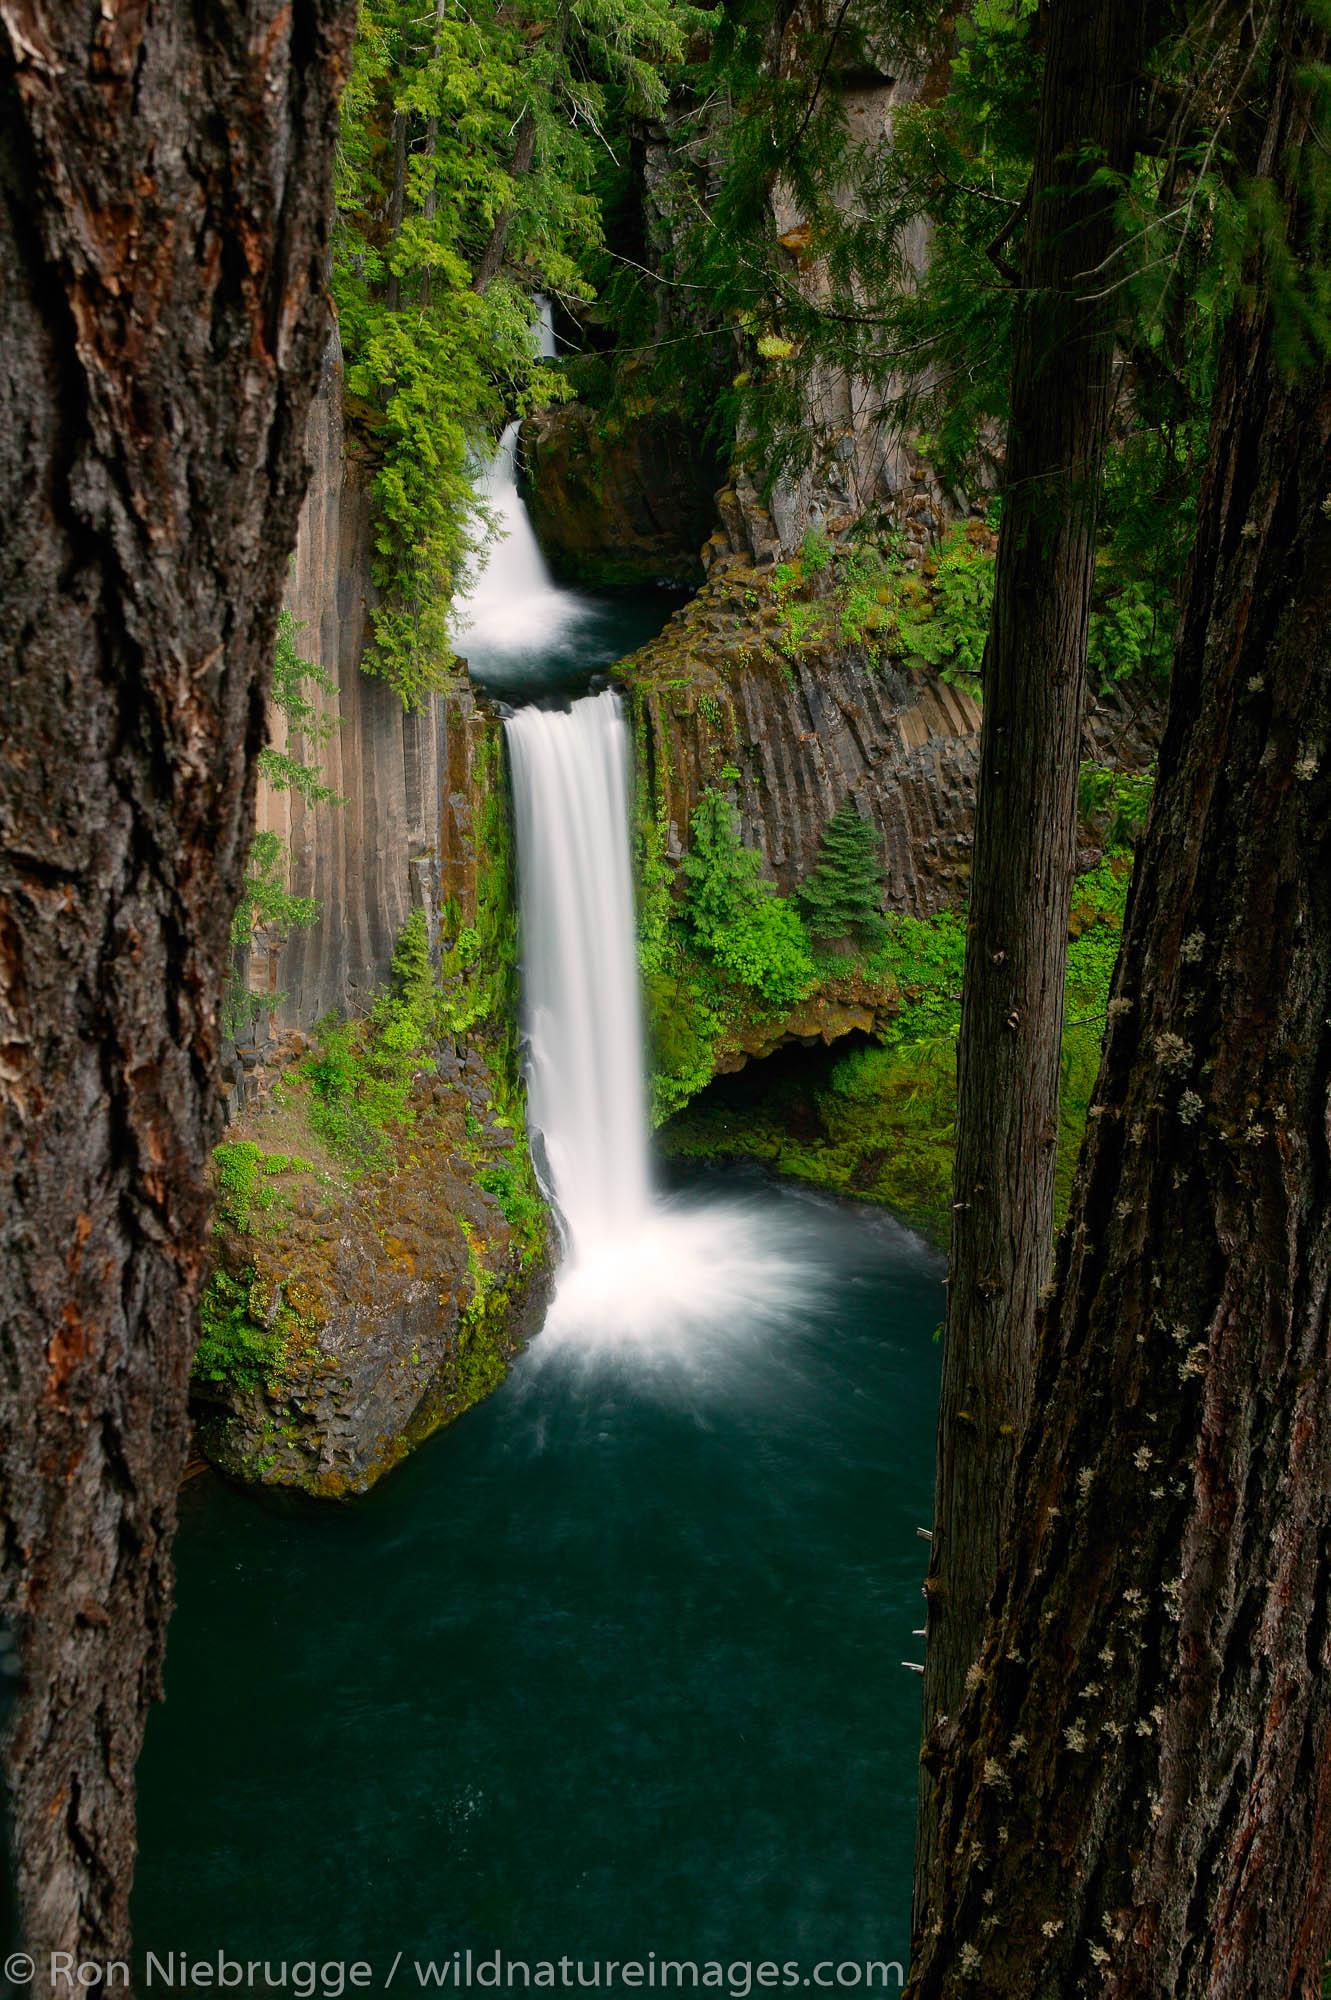 Toketee Falls in the Umpqua National Forest, Oregon